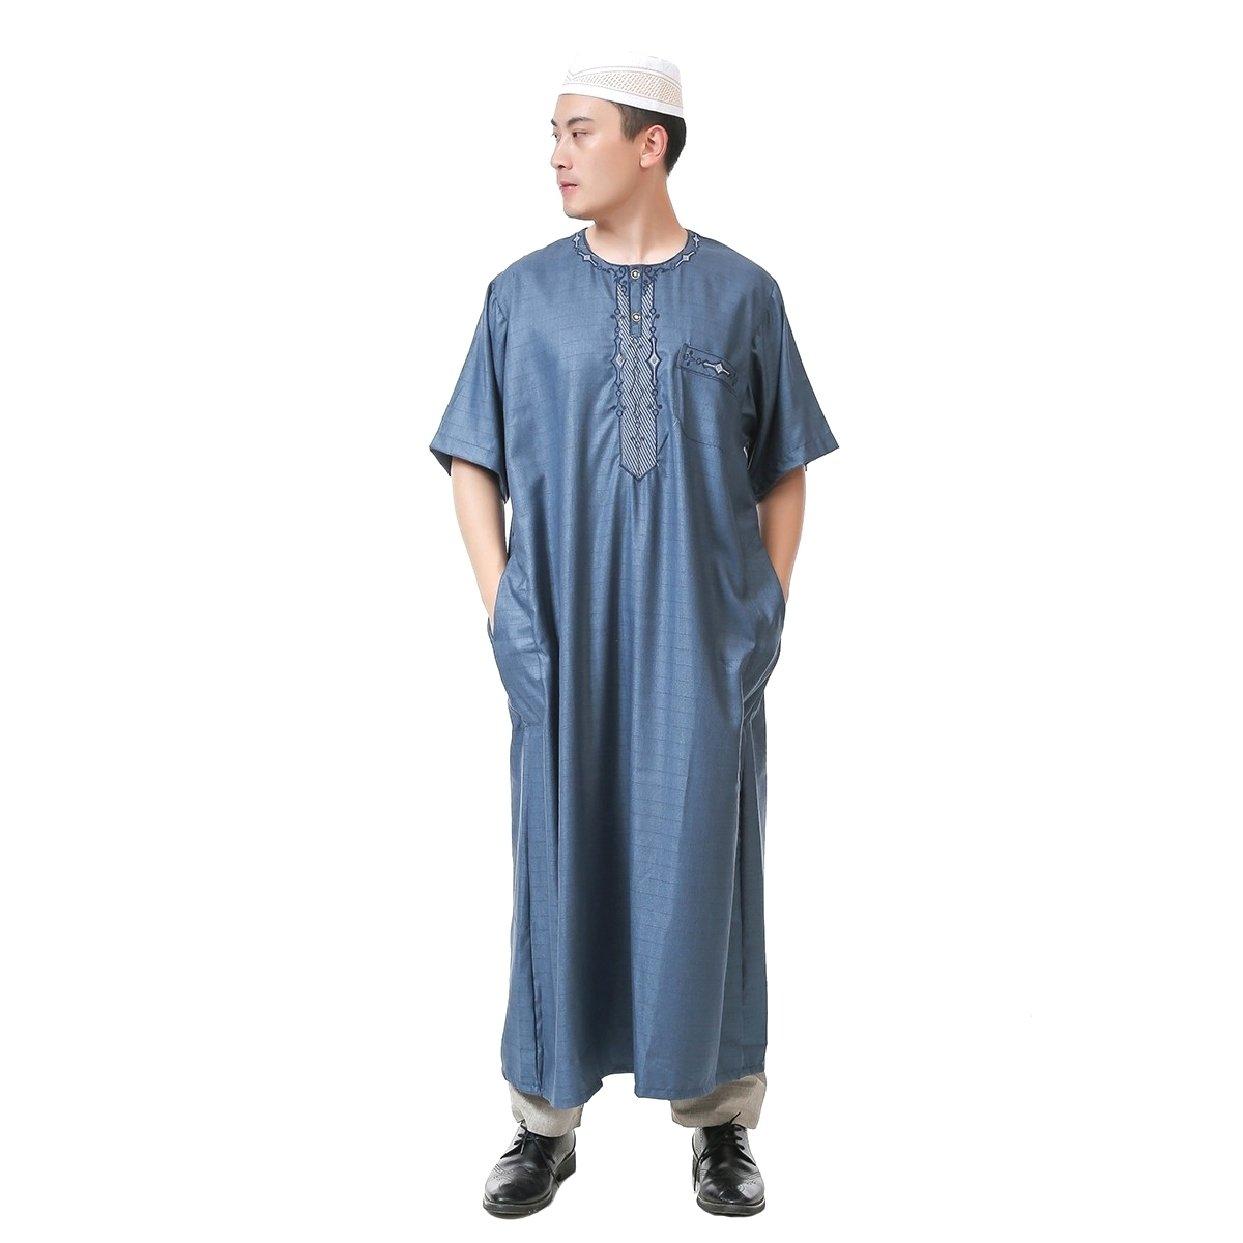 SportsX Mens Short-Sleeve Middle East Cotton Muslim Thobes Dishdasha Dark Blue 58